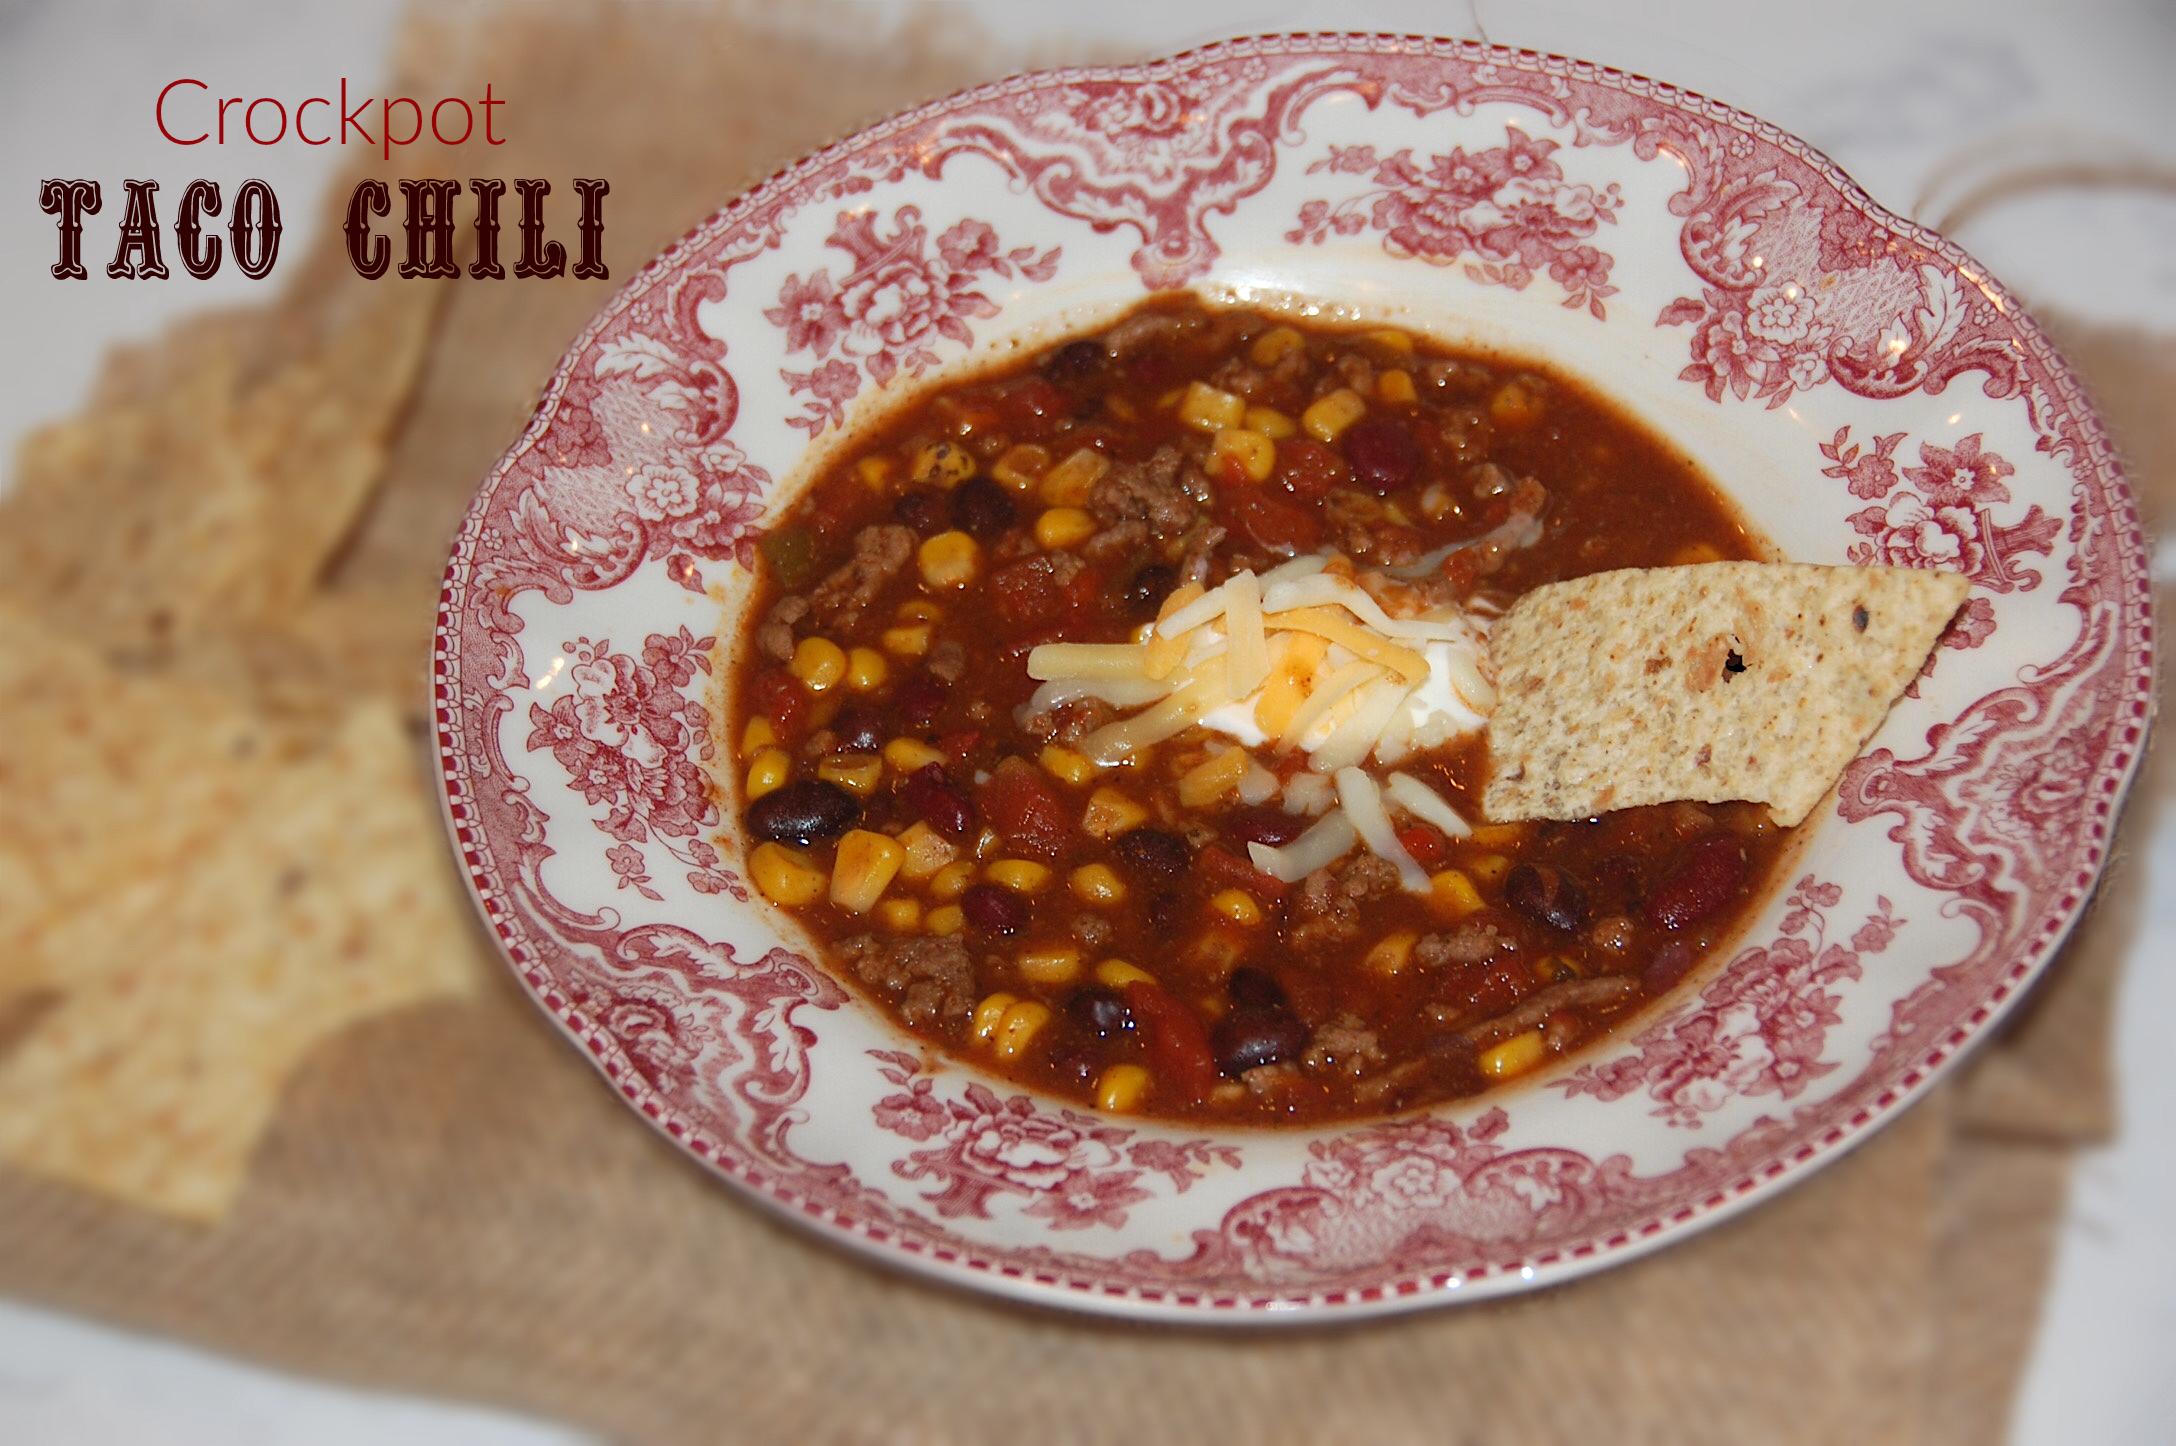 Crockpot: Taco Chili 2